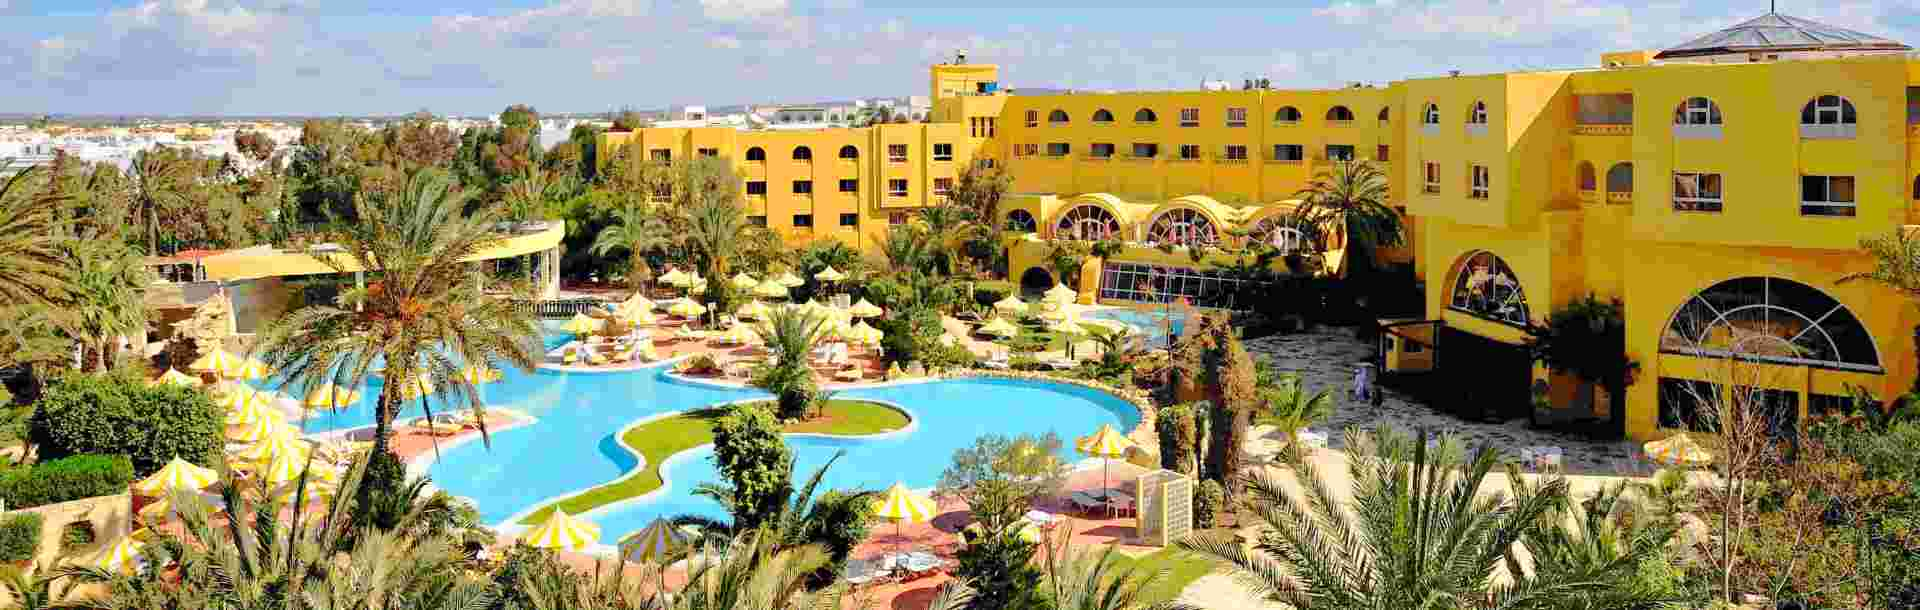 Отель цепочки Iberostar, Тунис